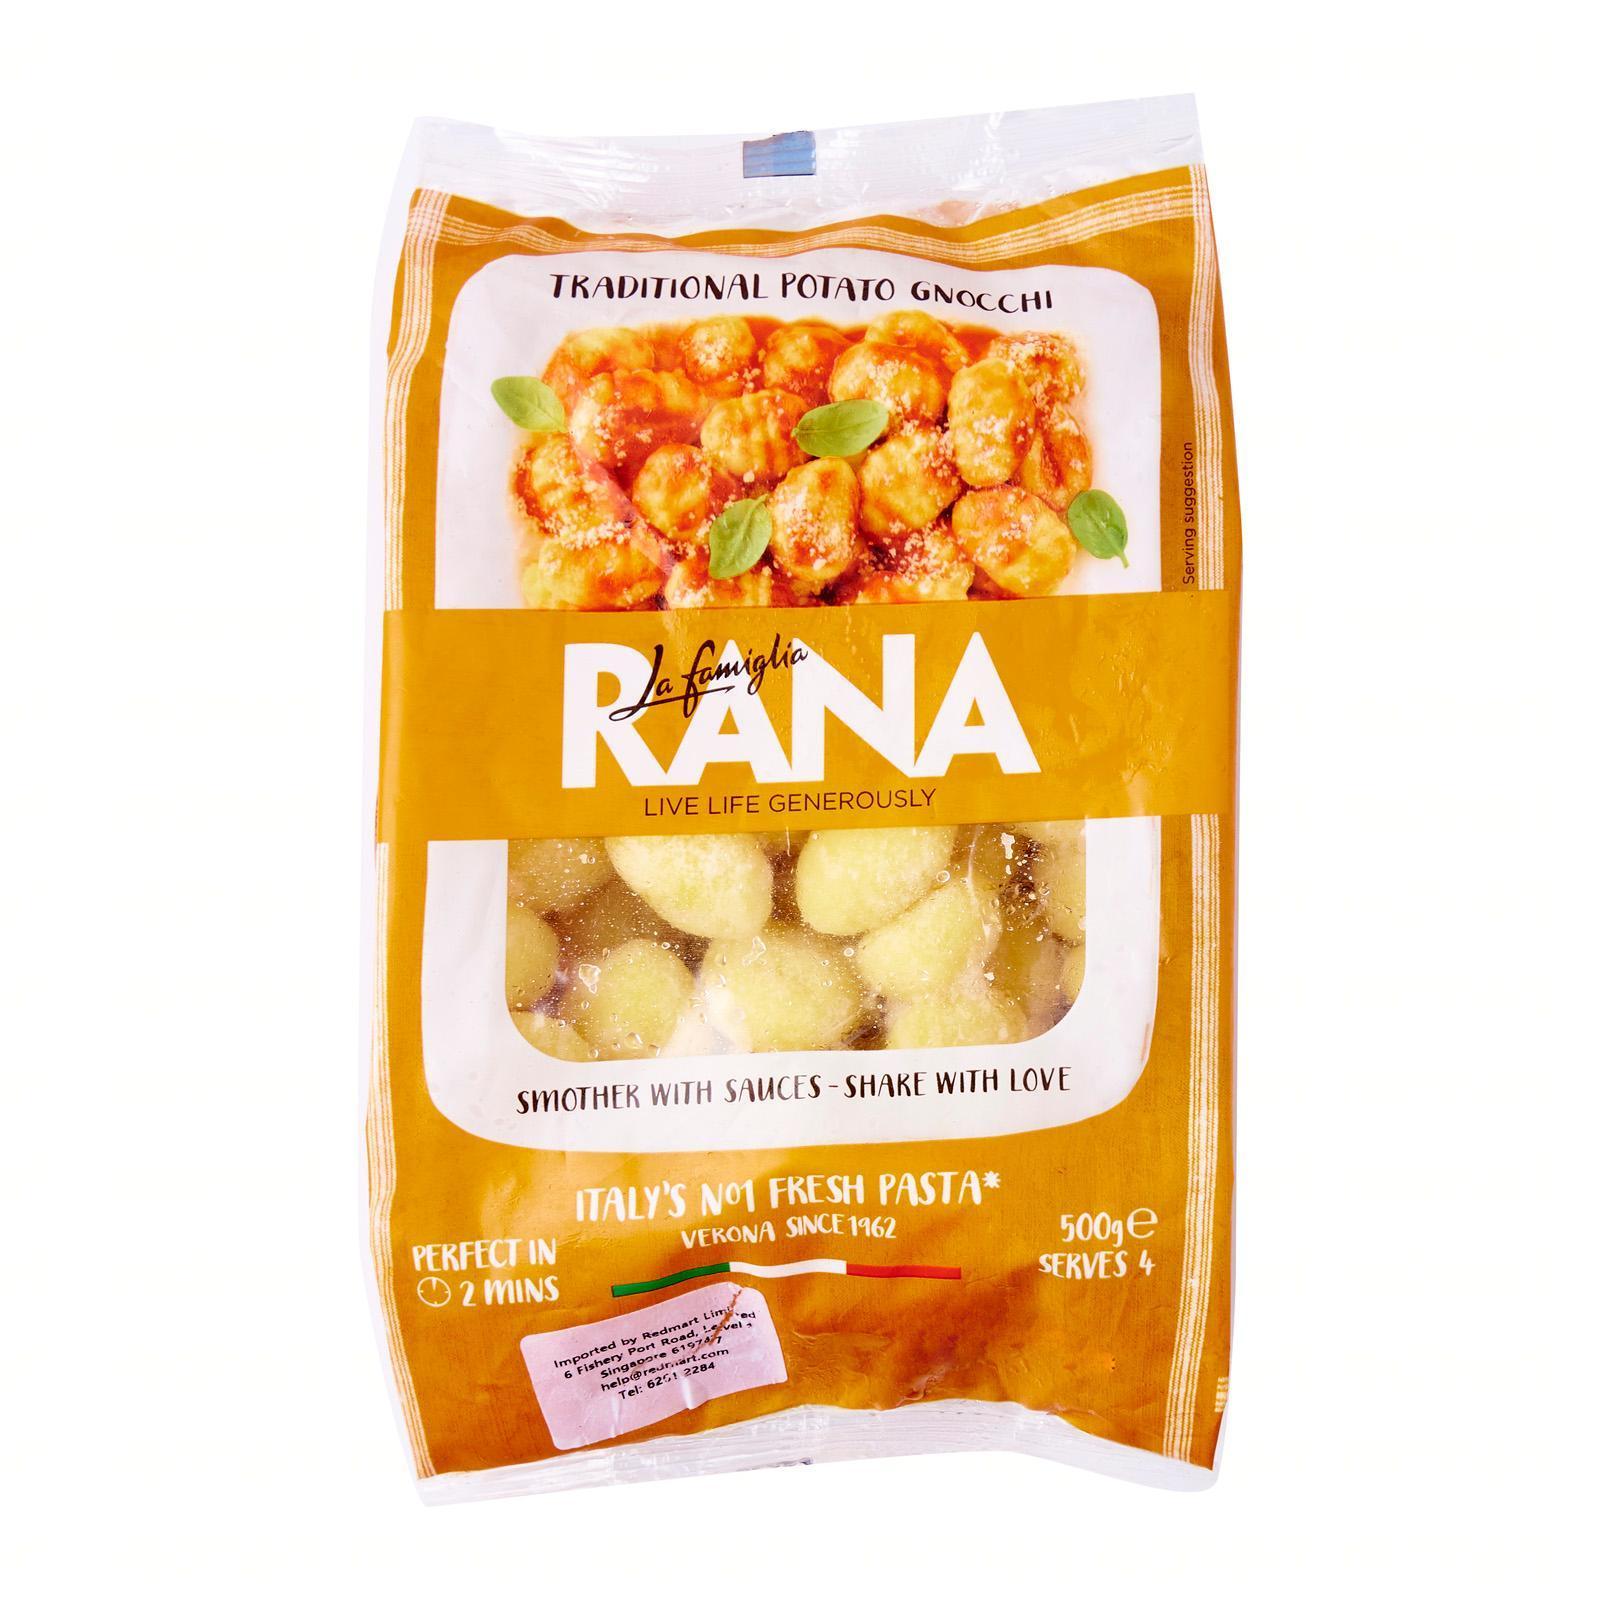 Giovanni Rana Potato Gnocchi Ready To Cook By Redmart.